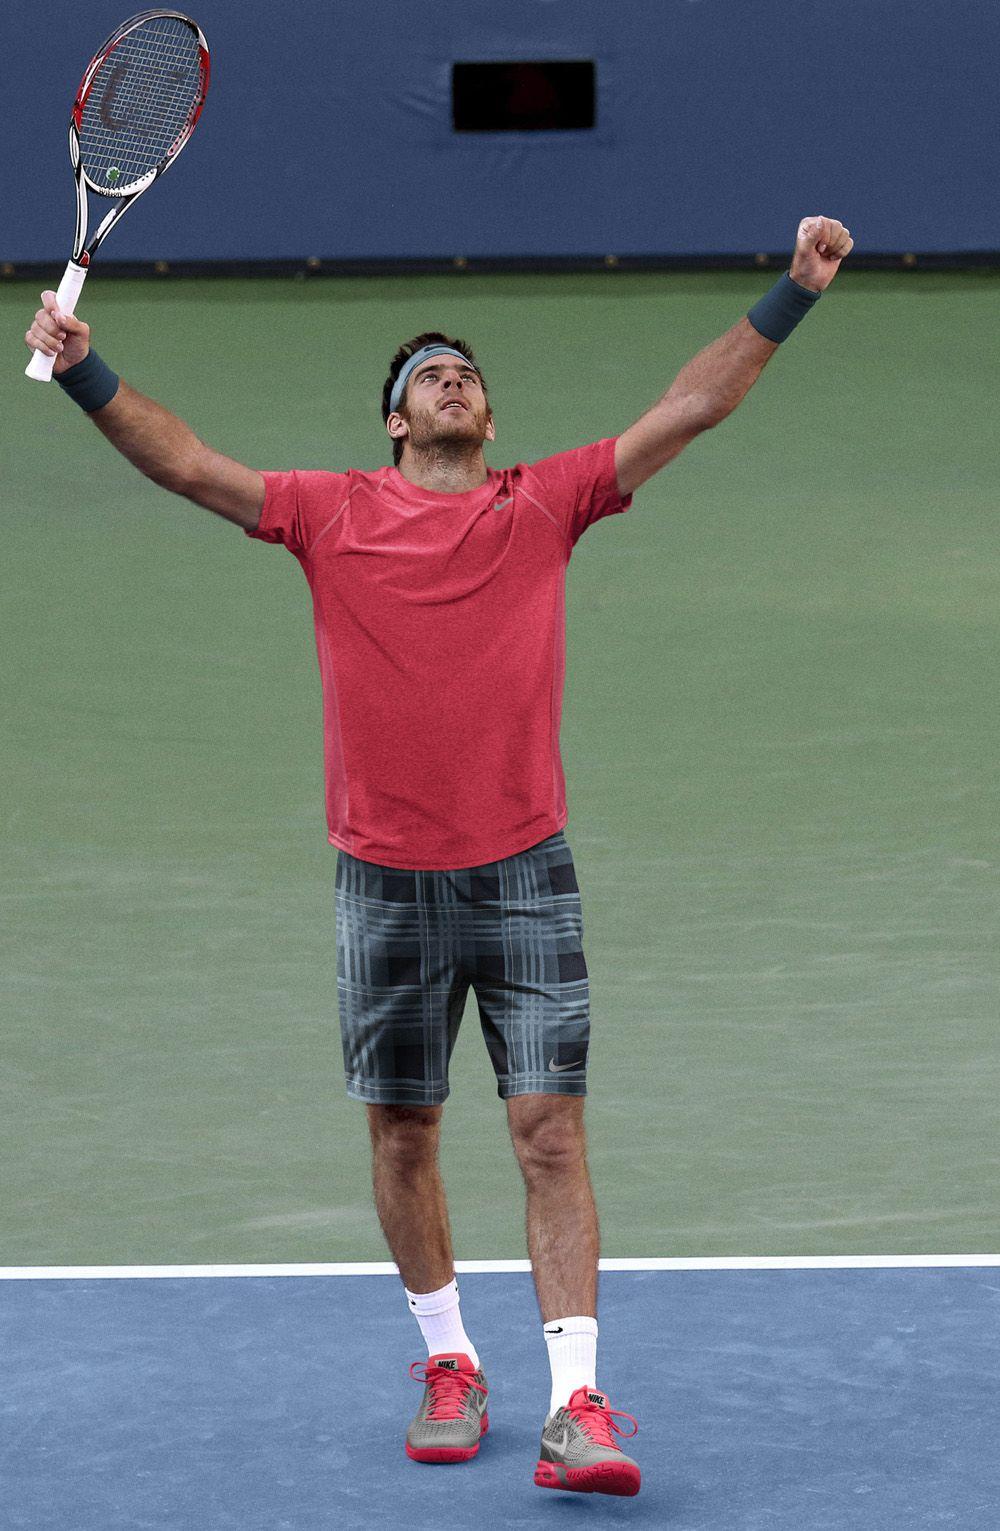 Mañana Él Un fiel  Nike Tennis Collection for US Open 2013 | Juan martín del potro, Potrillos,  Tenis